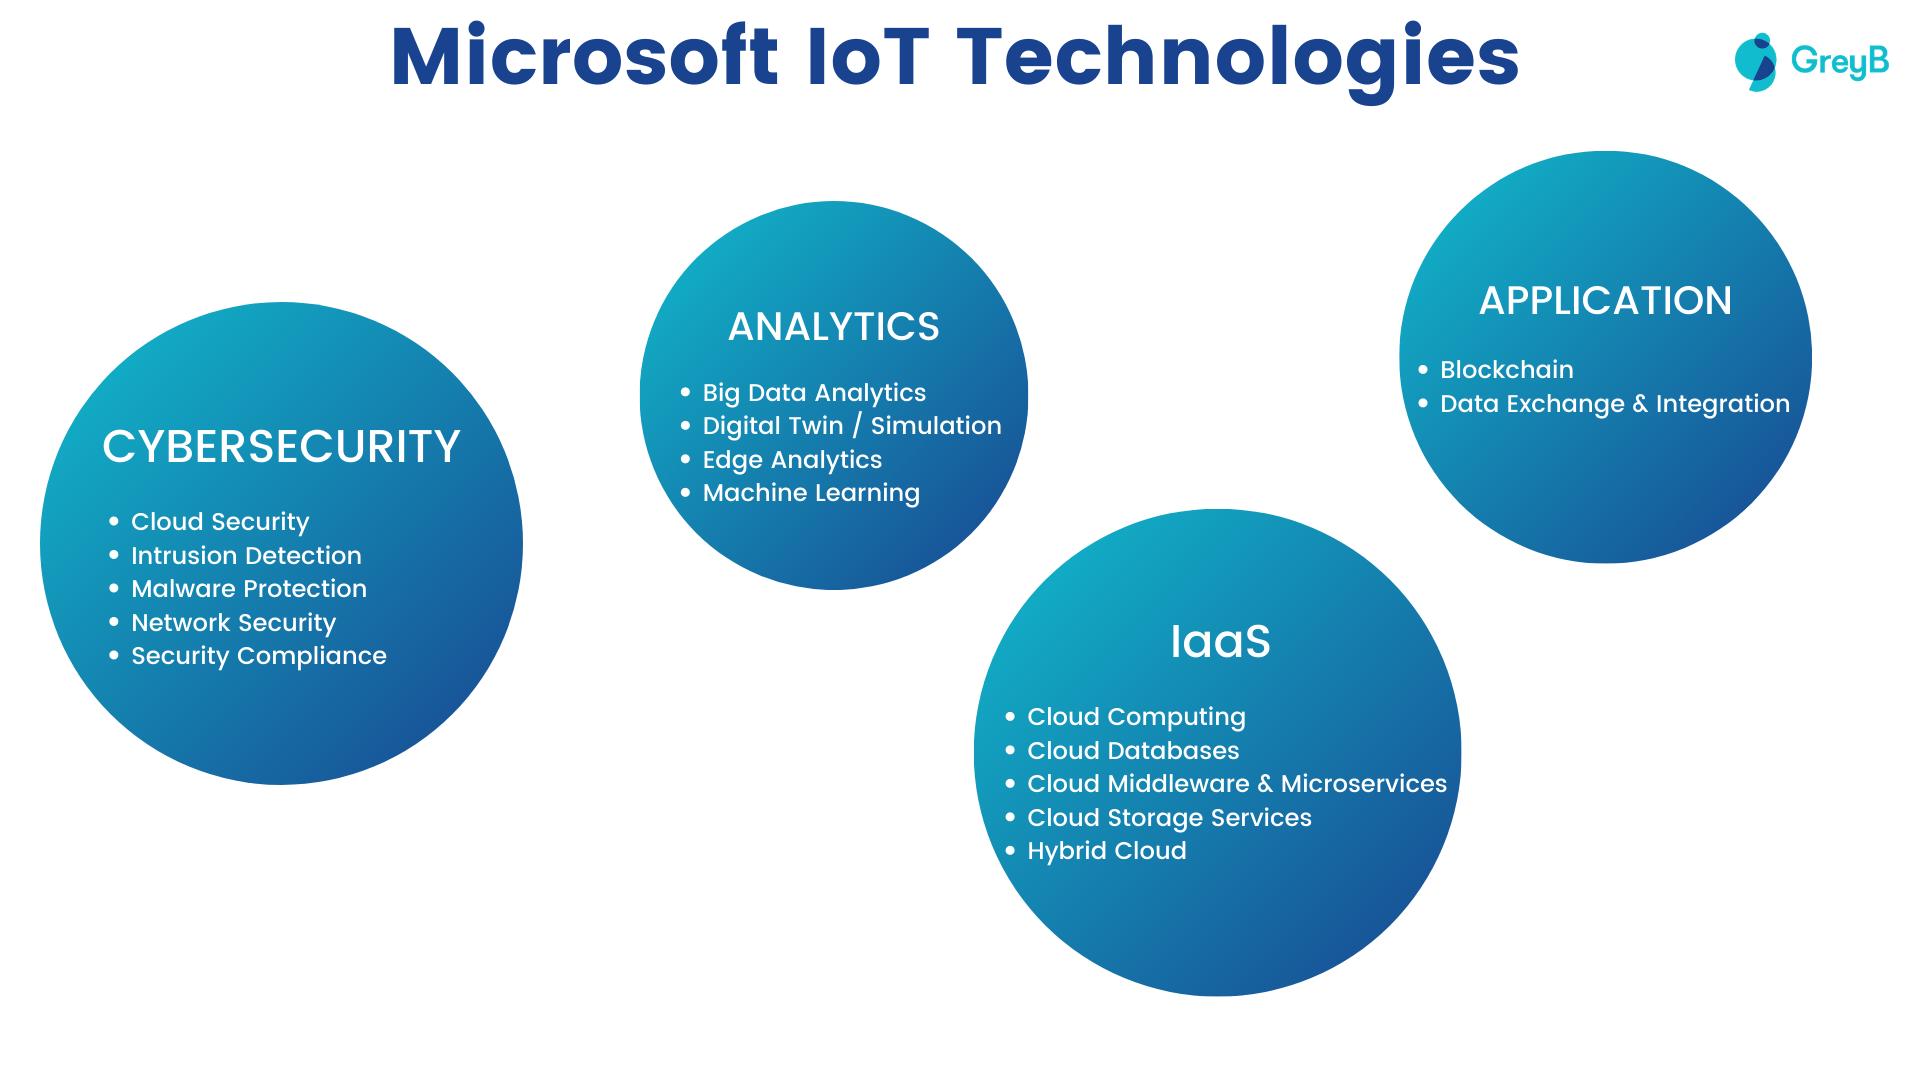 Microsoft IoT Technologies